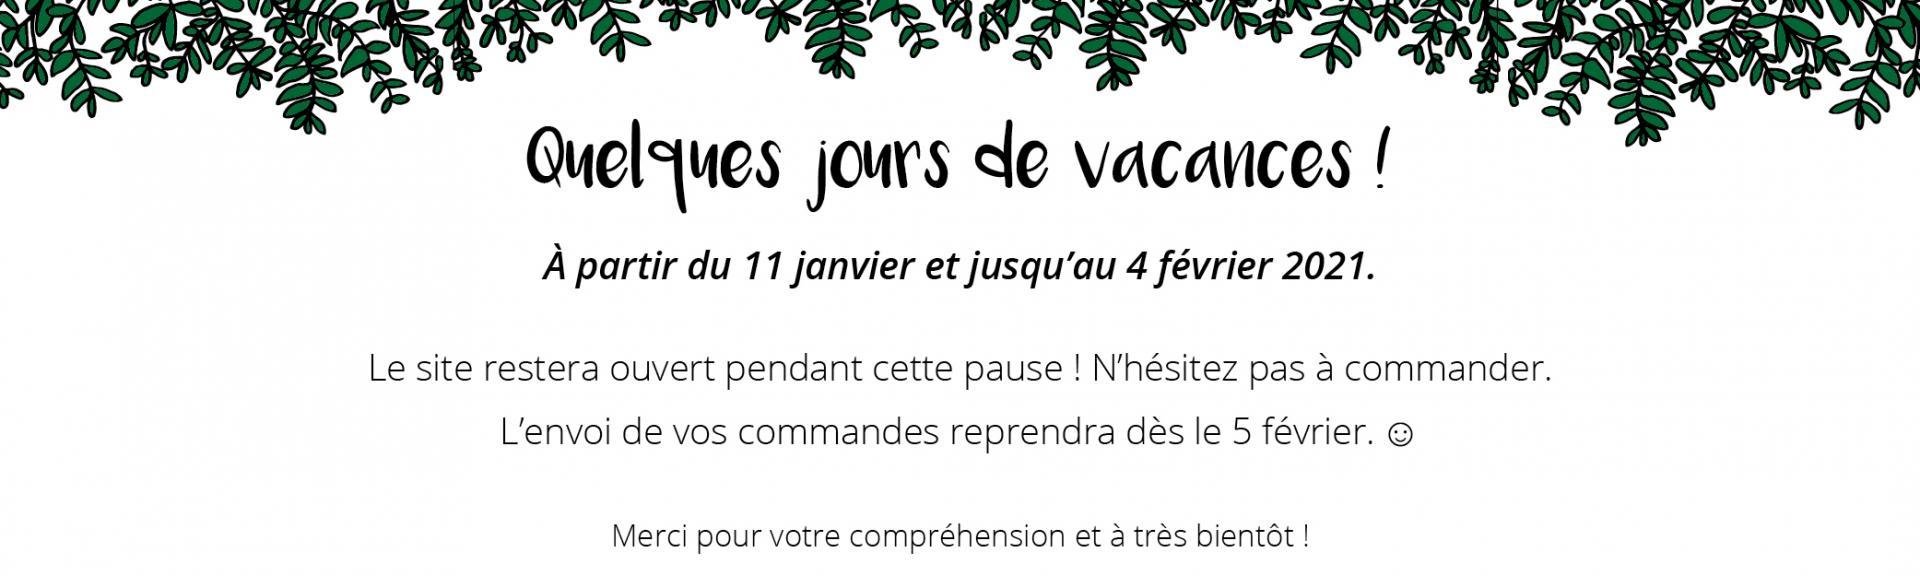 Vacances janvier